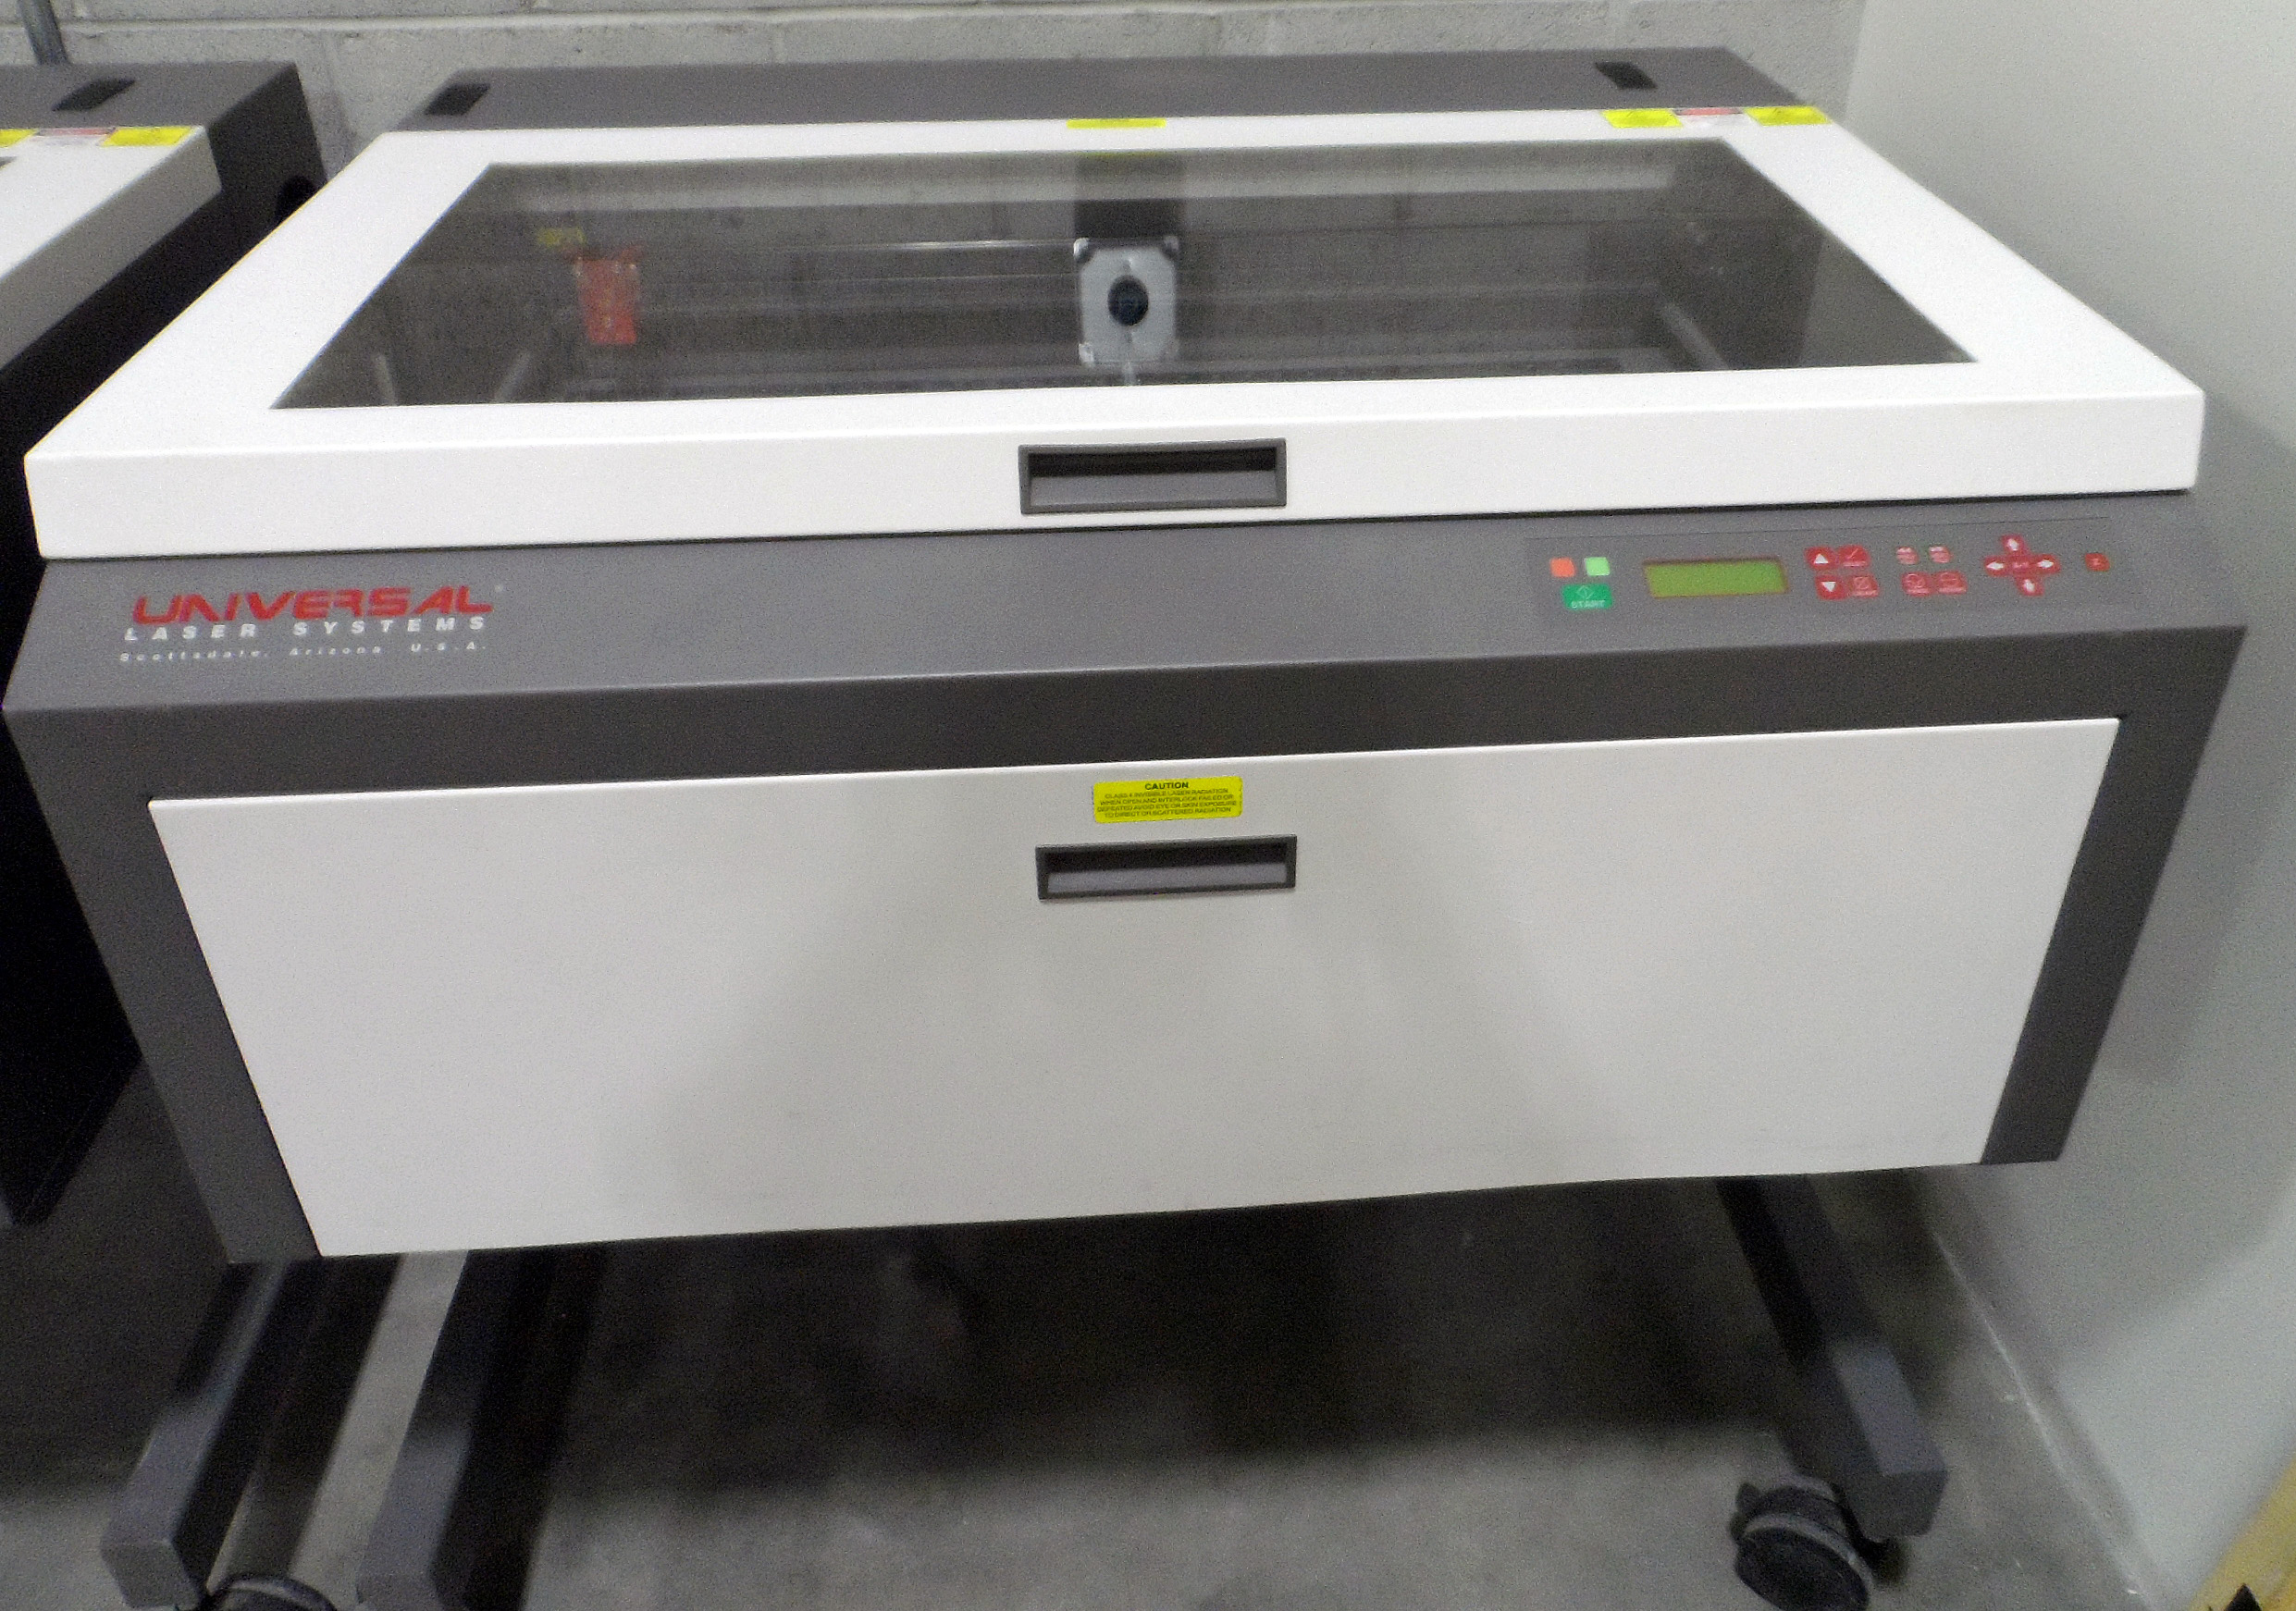 Refurbished X-660 45-watt or 25-watt